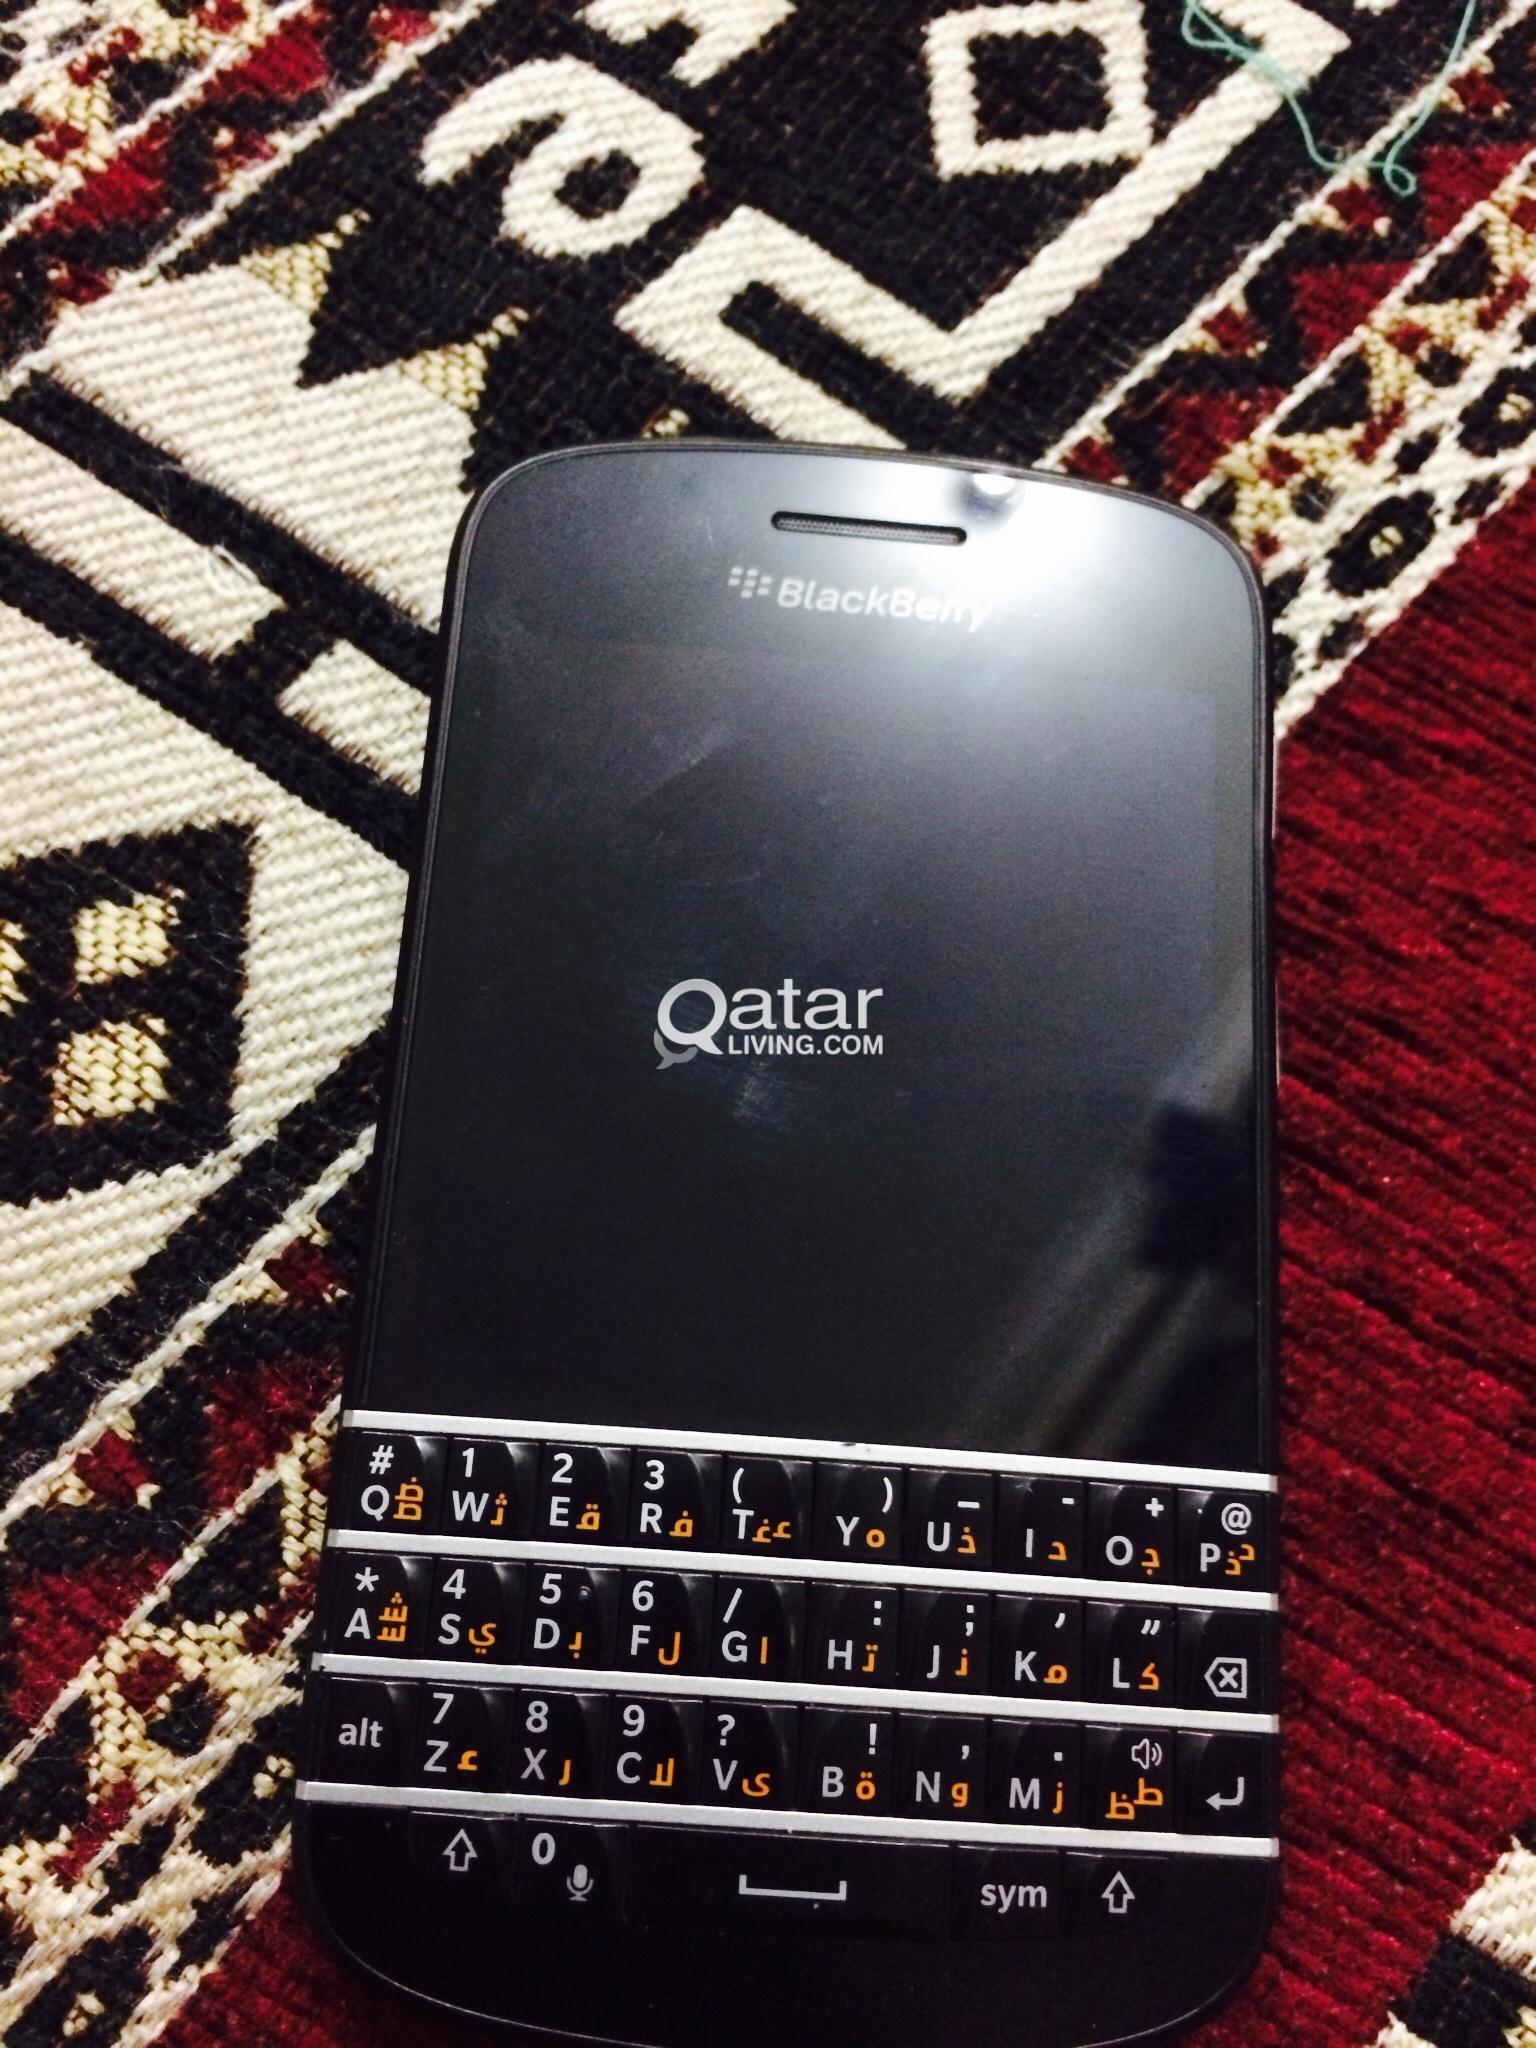 Blackberry Q10 Black | Qatar Living